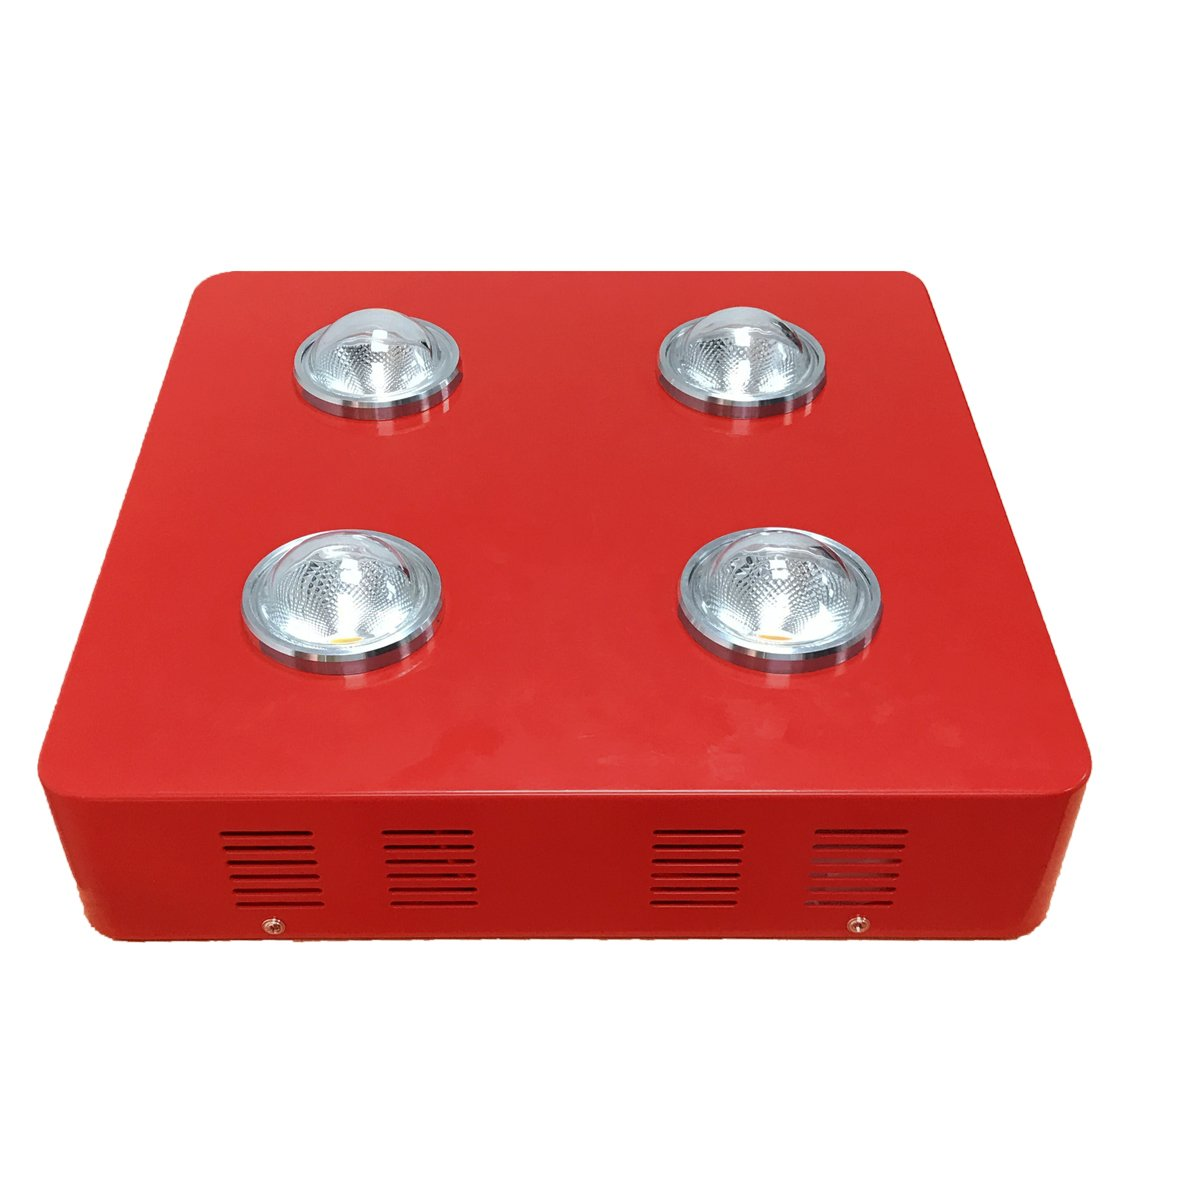 20 Pack 20pcs Cone Spikes Screwback Studs DIY Craft Cool Rivets Punk Stud Coincal 9x35mm Silver